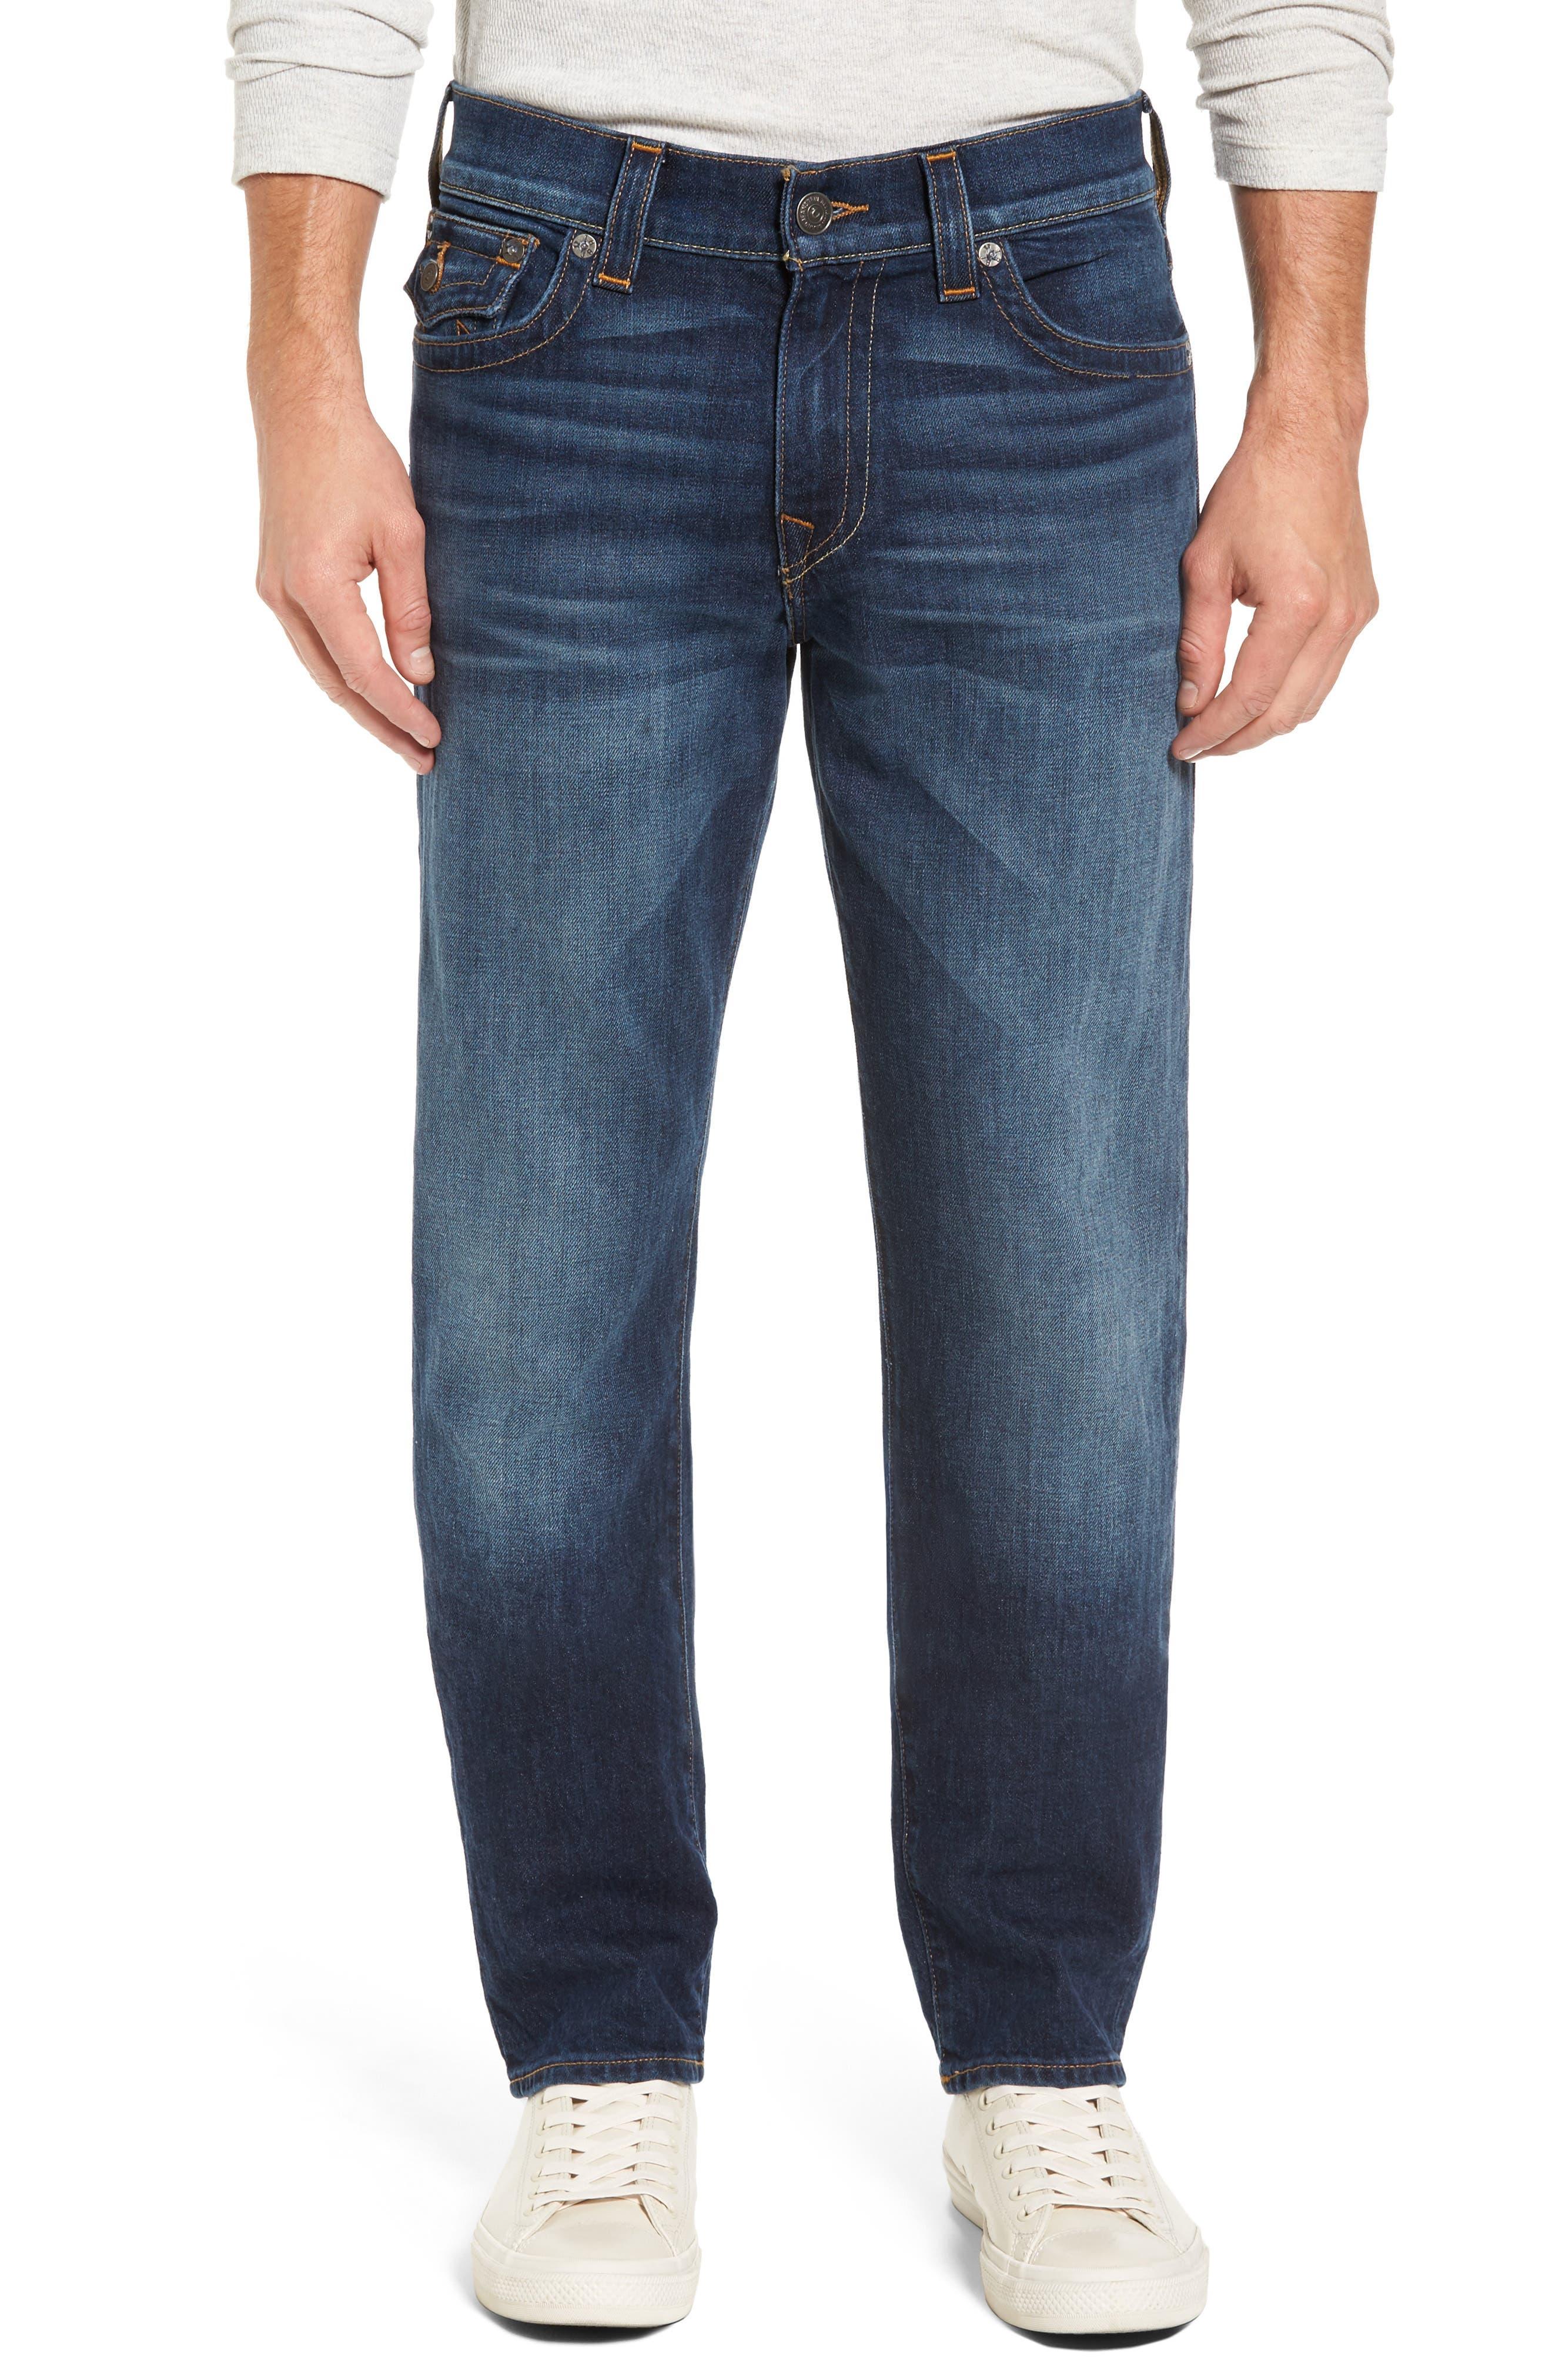 True Religion Brand Jeans Geno Straight Leg Jeans (Blue Cascade)